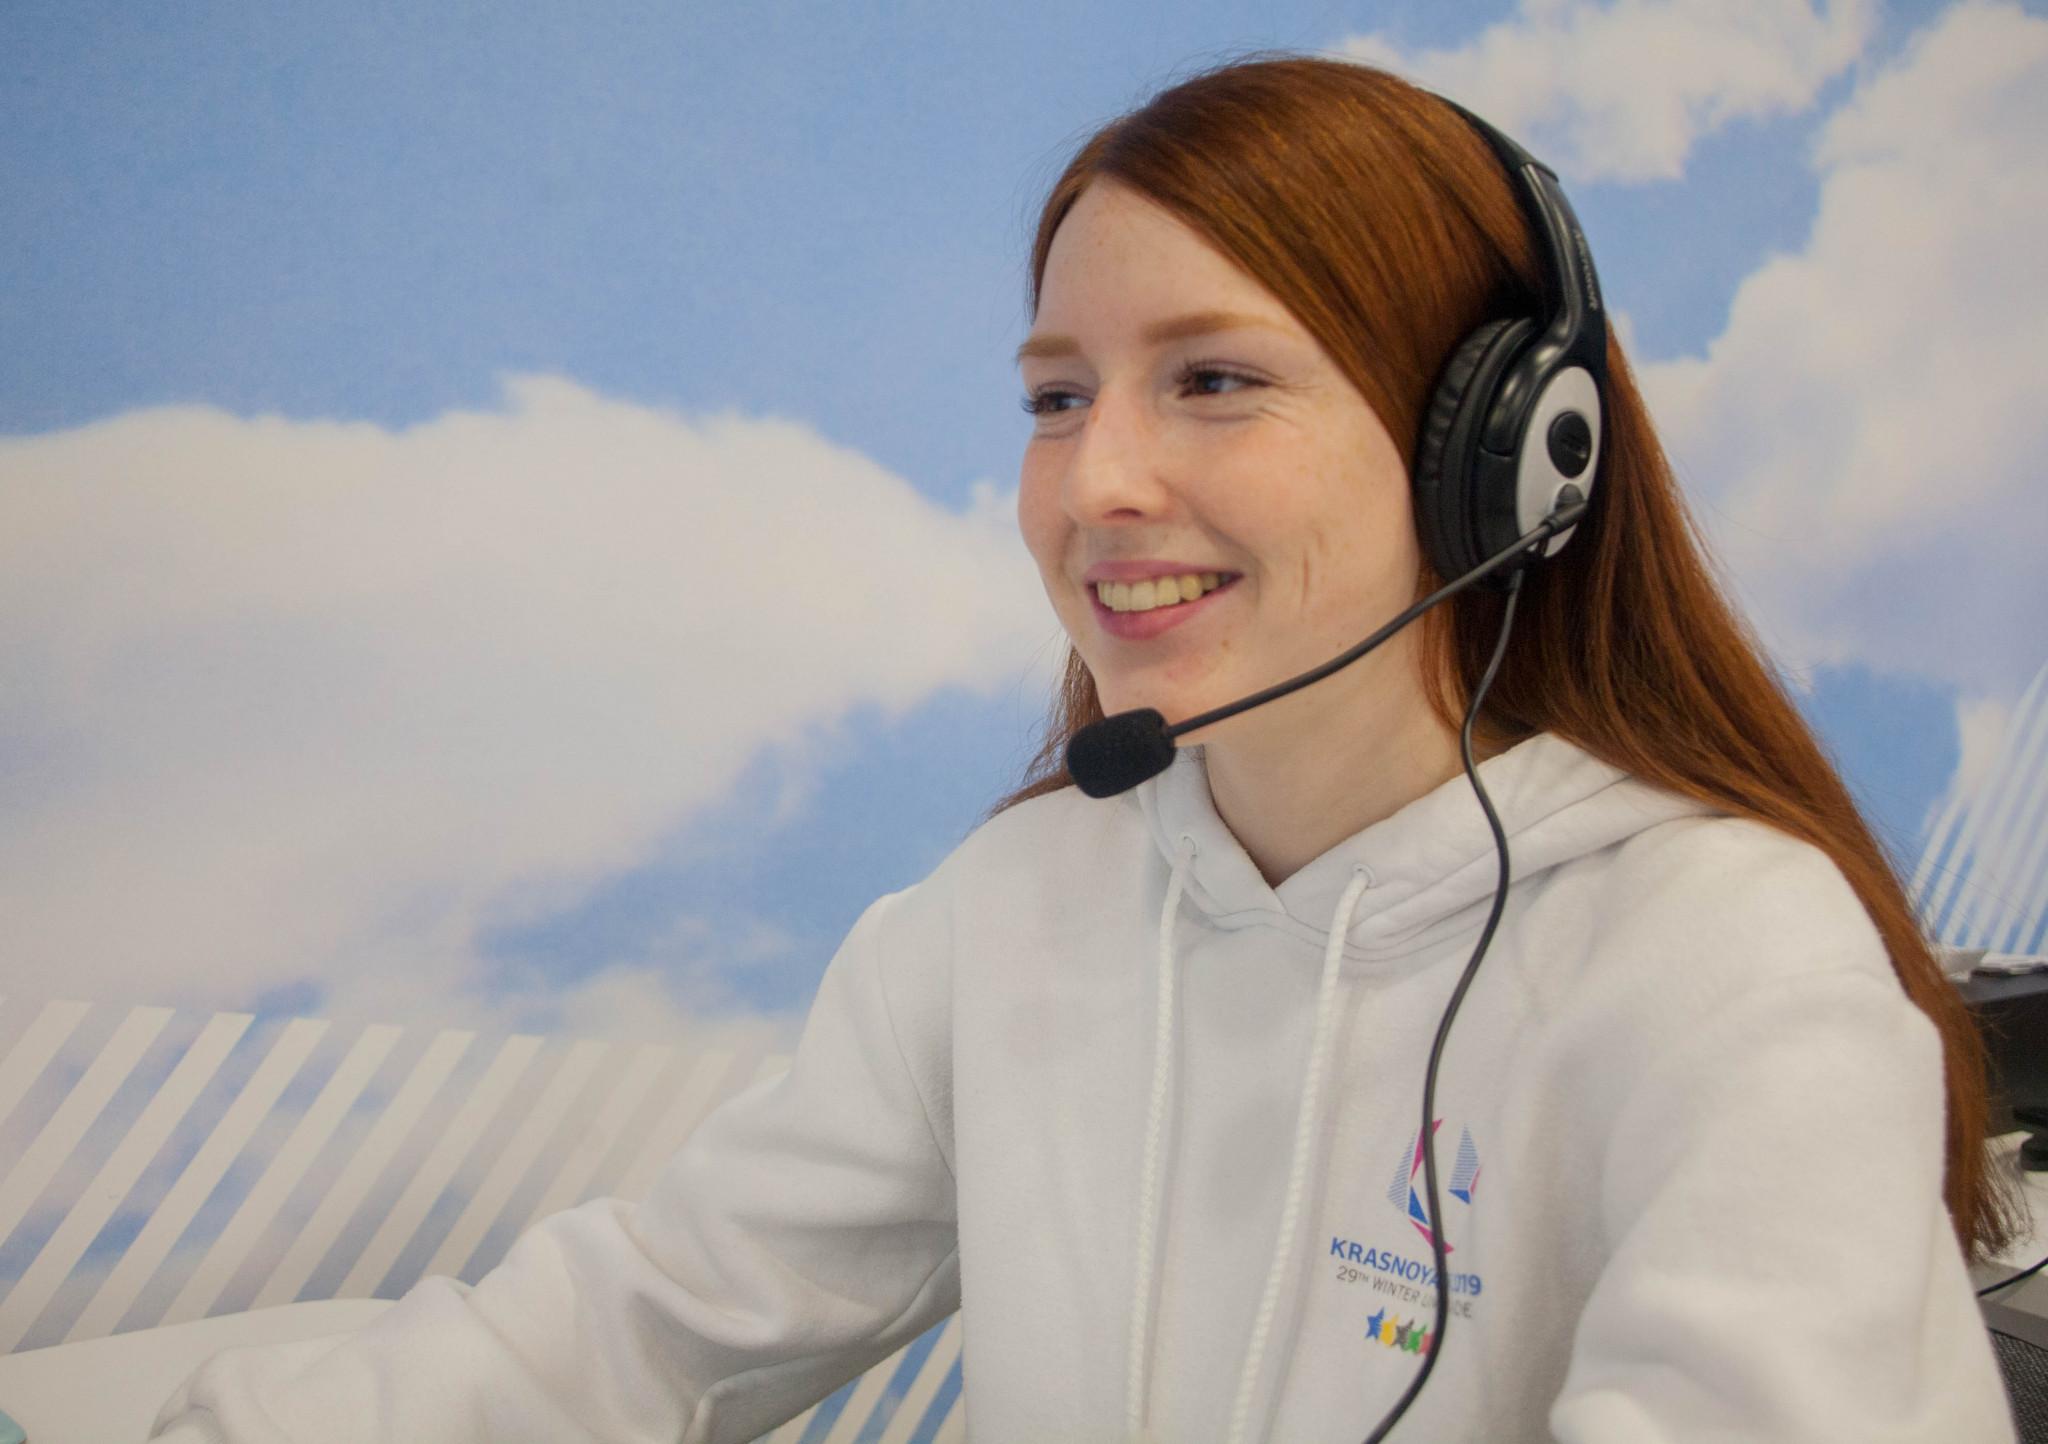 Krasnoyarsk 2019 are hoping all 5,000 volunteers at the Games will have a command of English ©Krasnoyarsk 2019